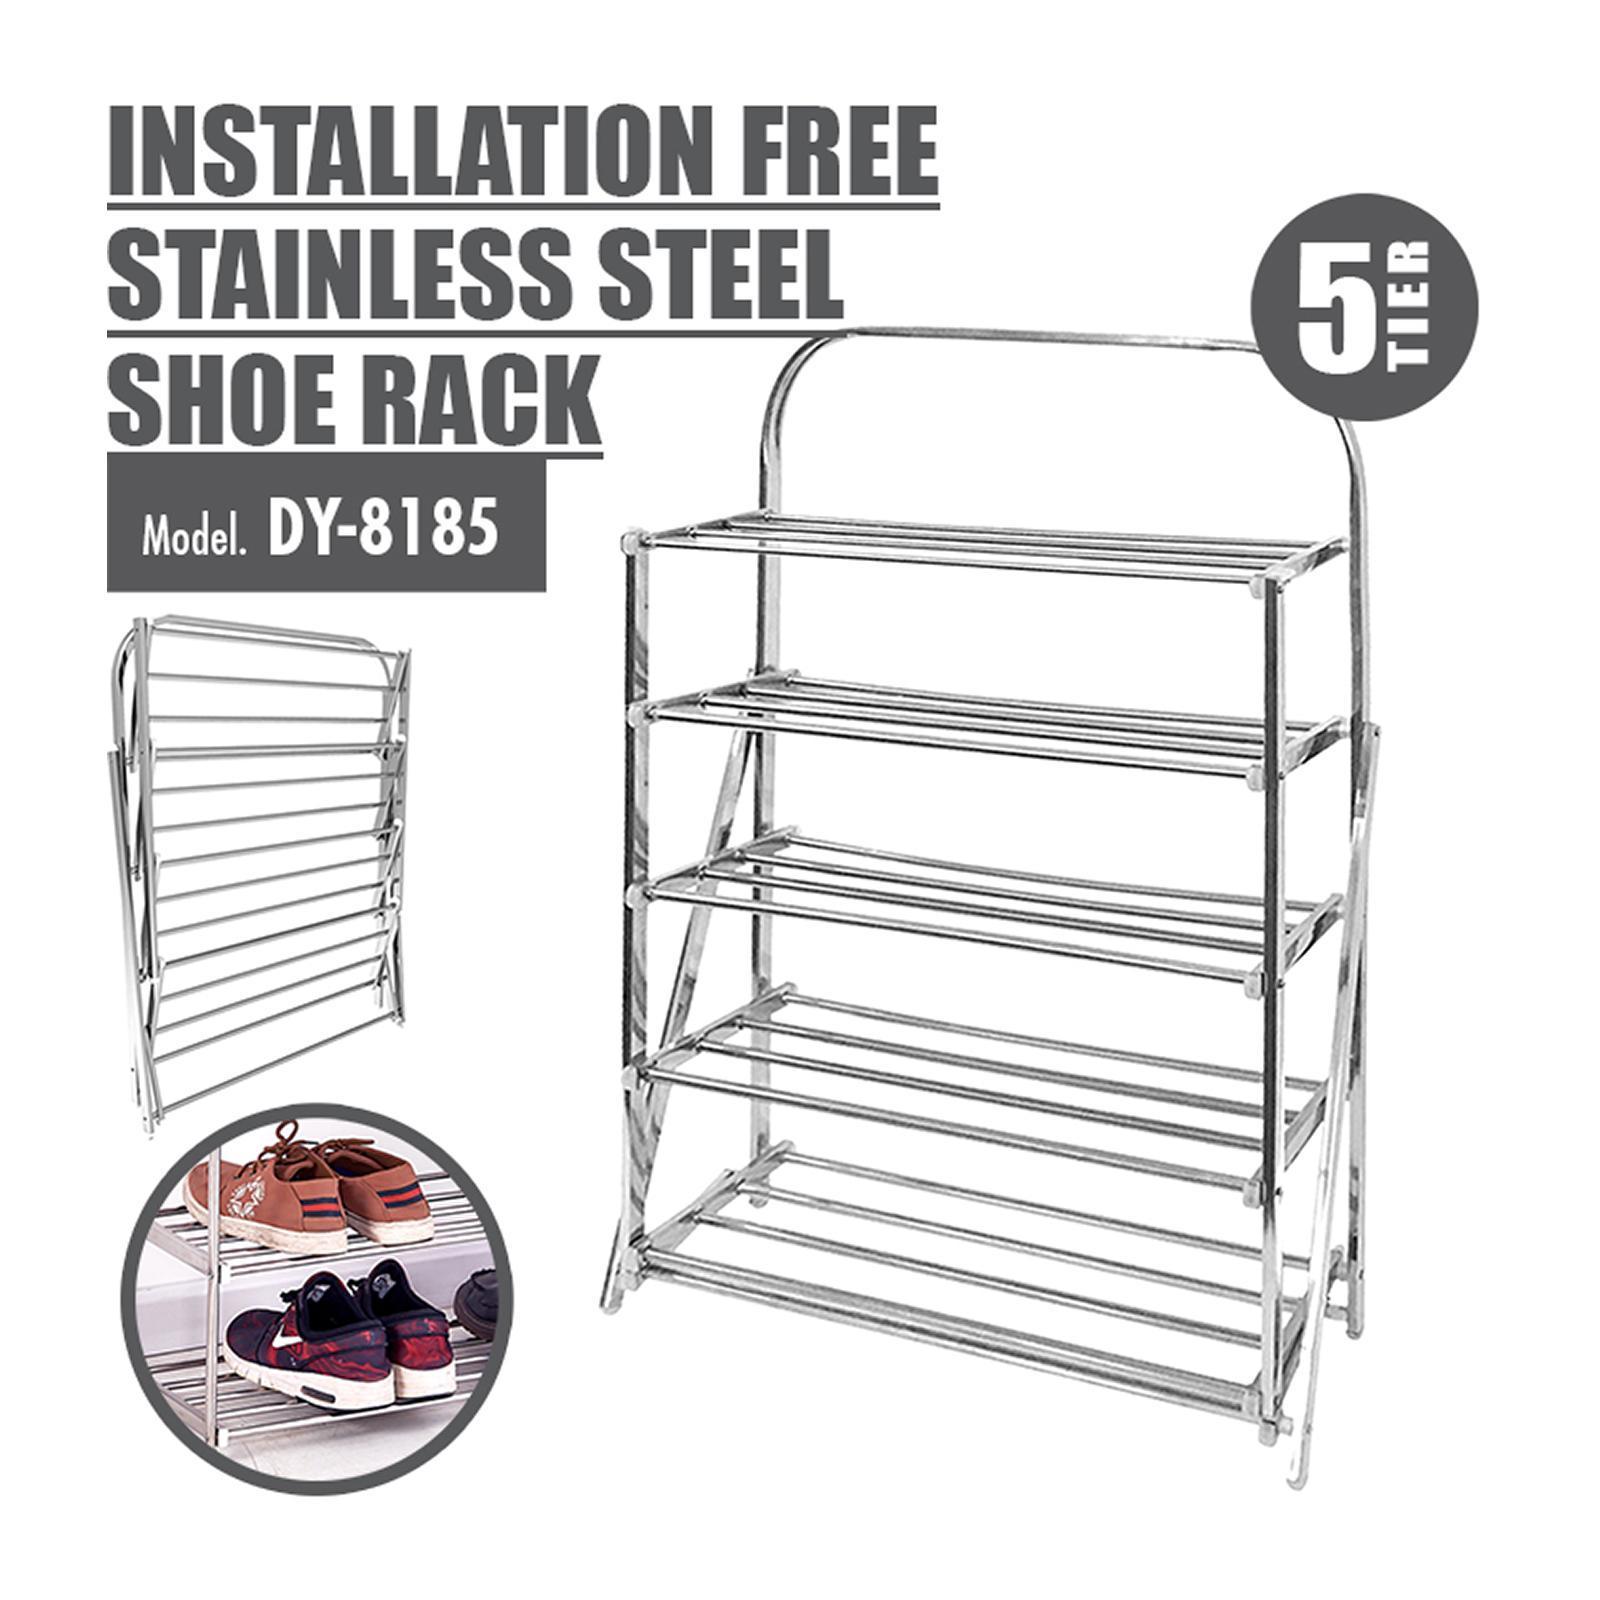 HOUZE 5 Tier Installation Free Stainless Steel Shoe Rack